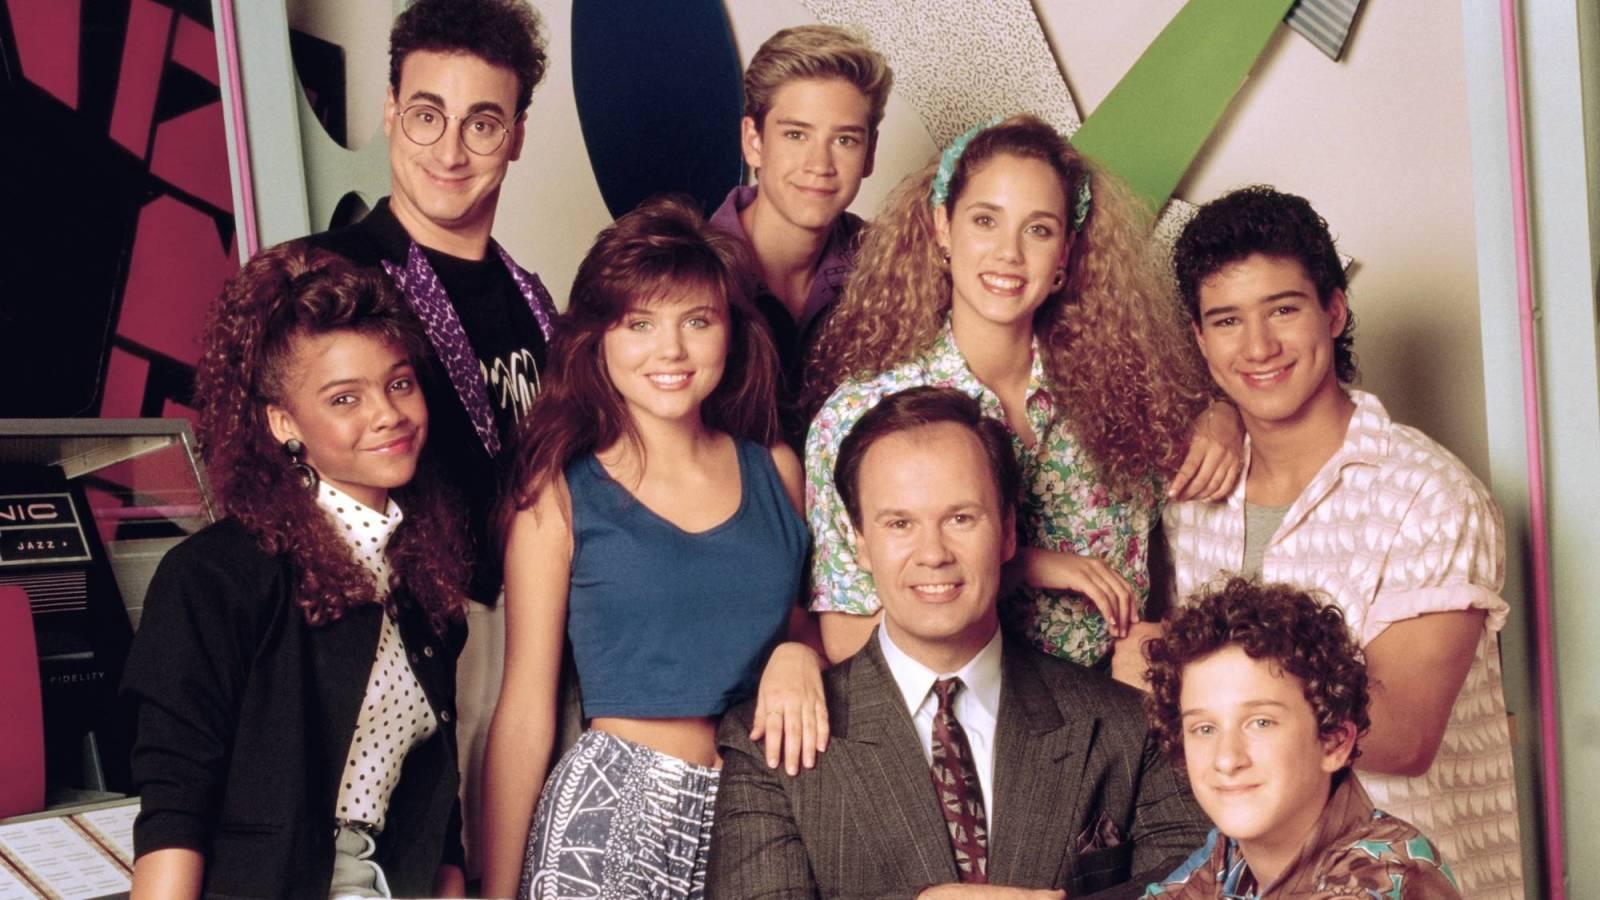 the favorite tv shows of 90s kids yardbarker yardbarker com